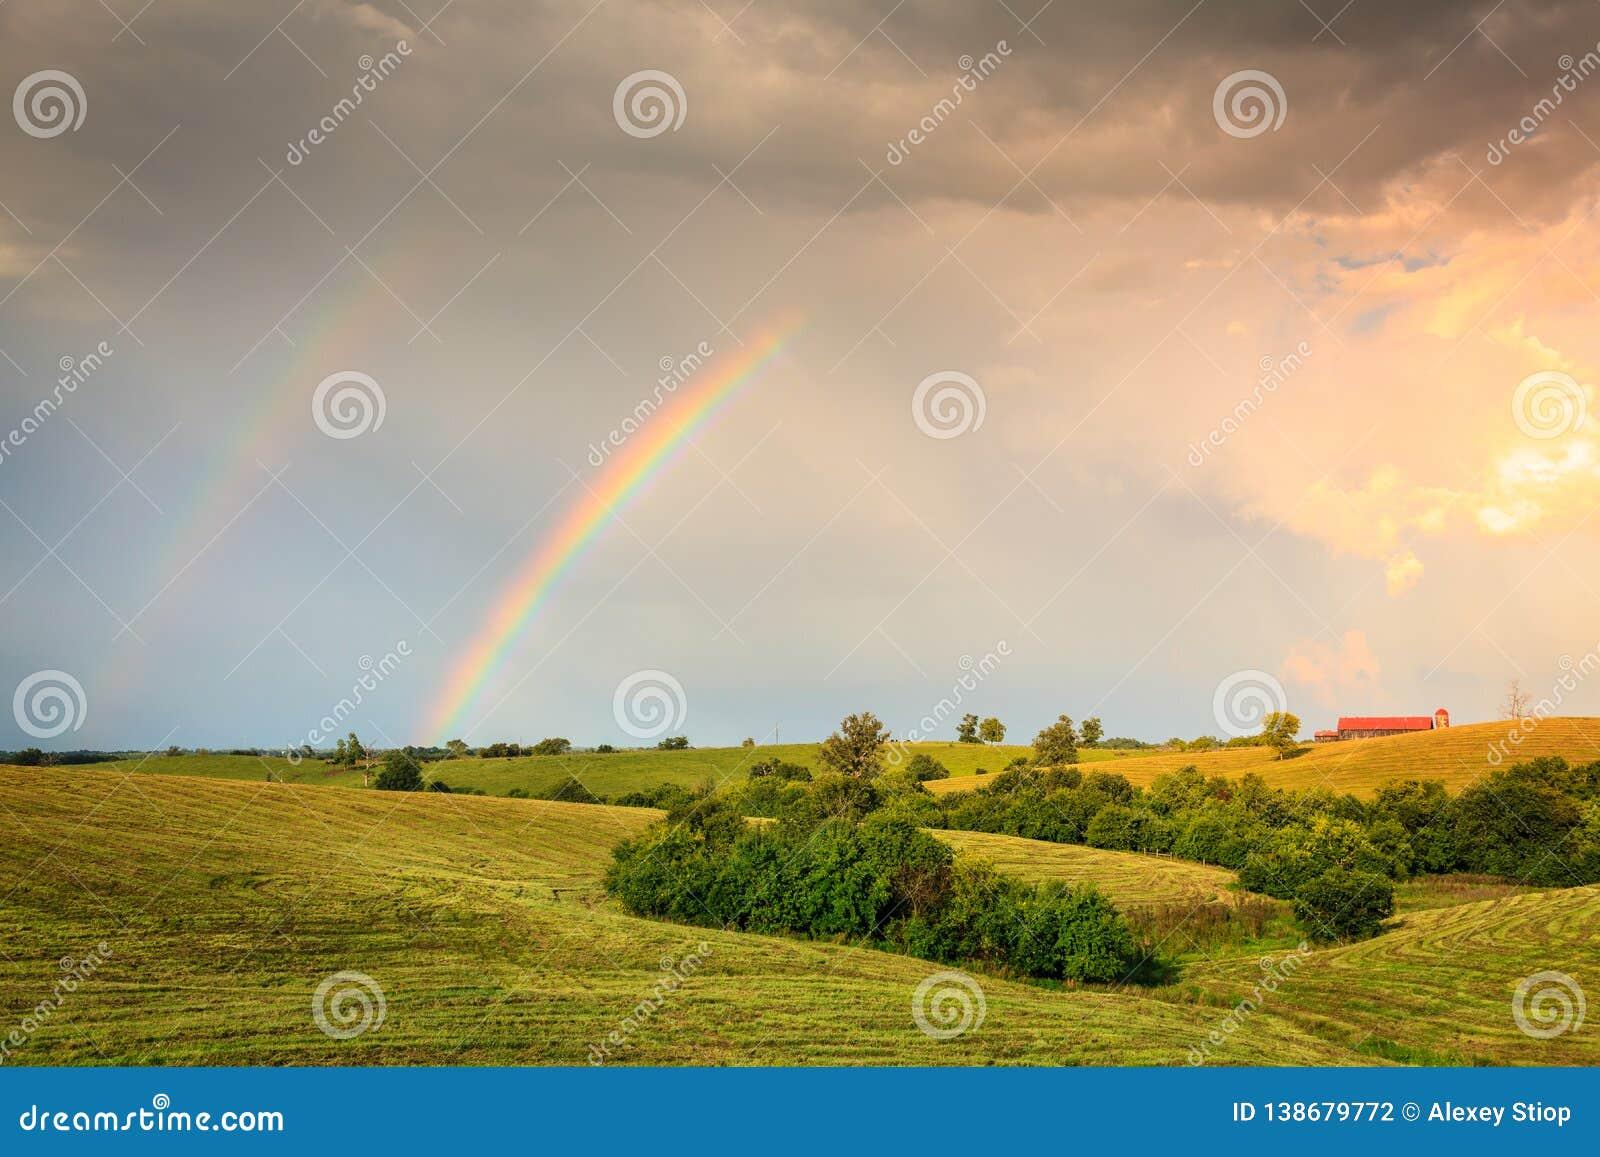 Rainbow over farmland in Central Kentucly